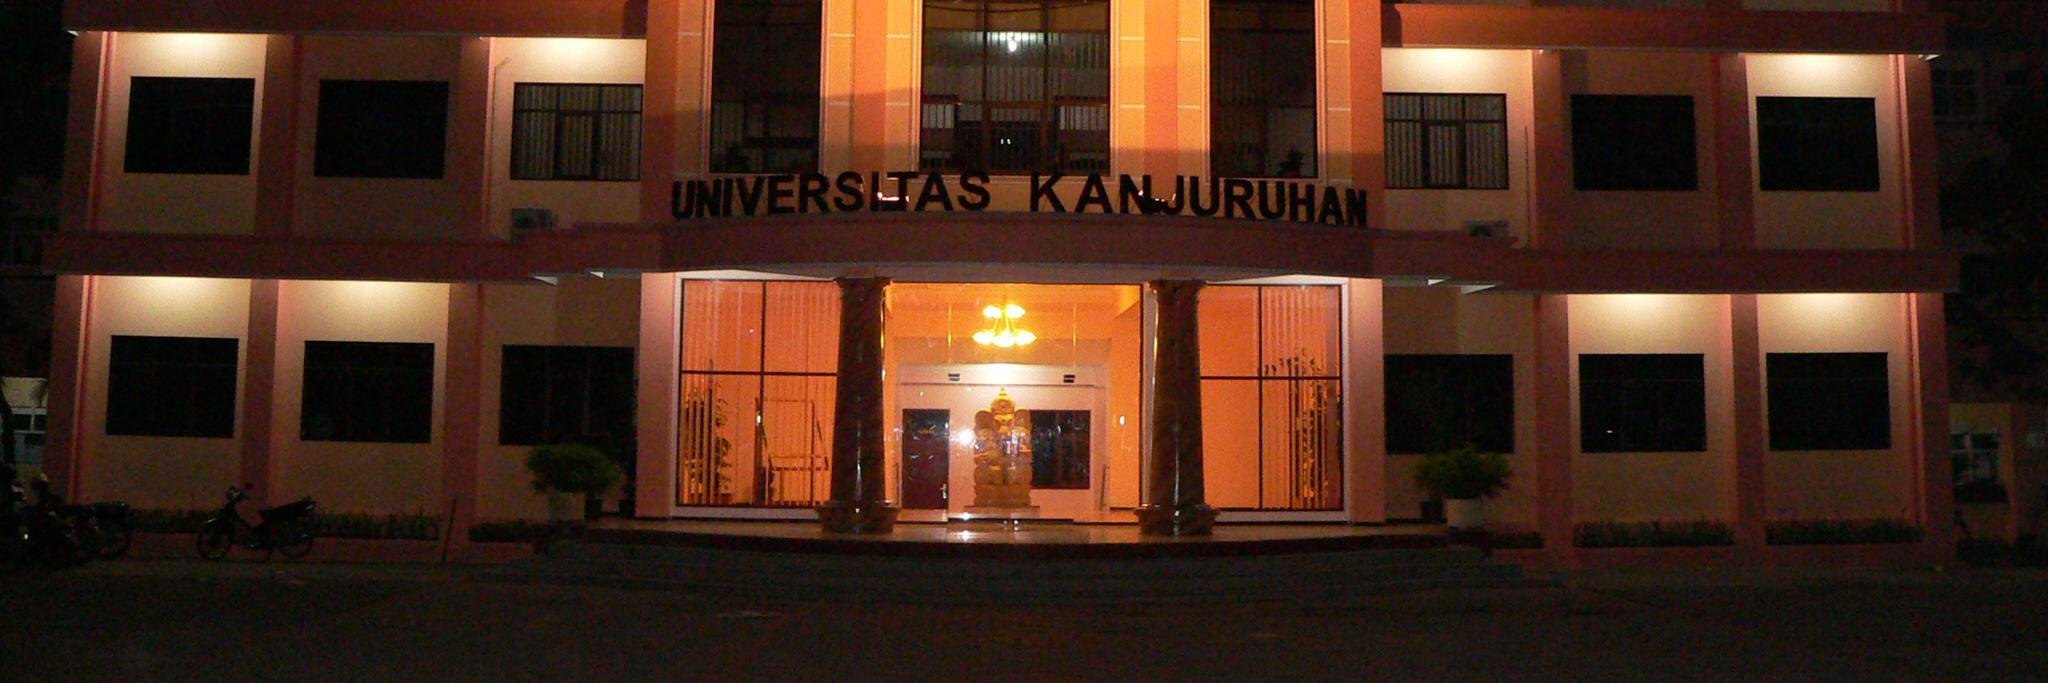 Universitas Kanjuruhan Malang's official Twitter account